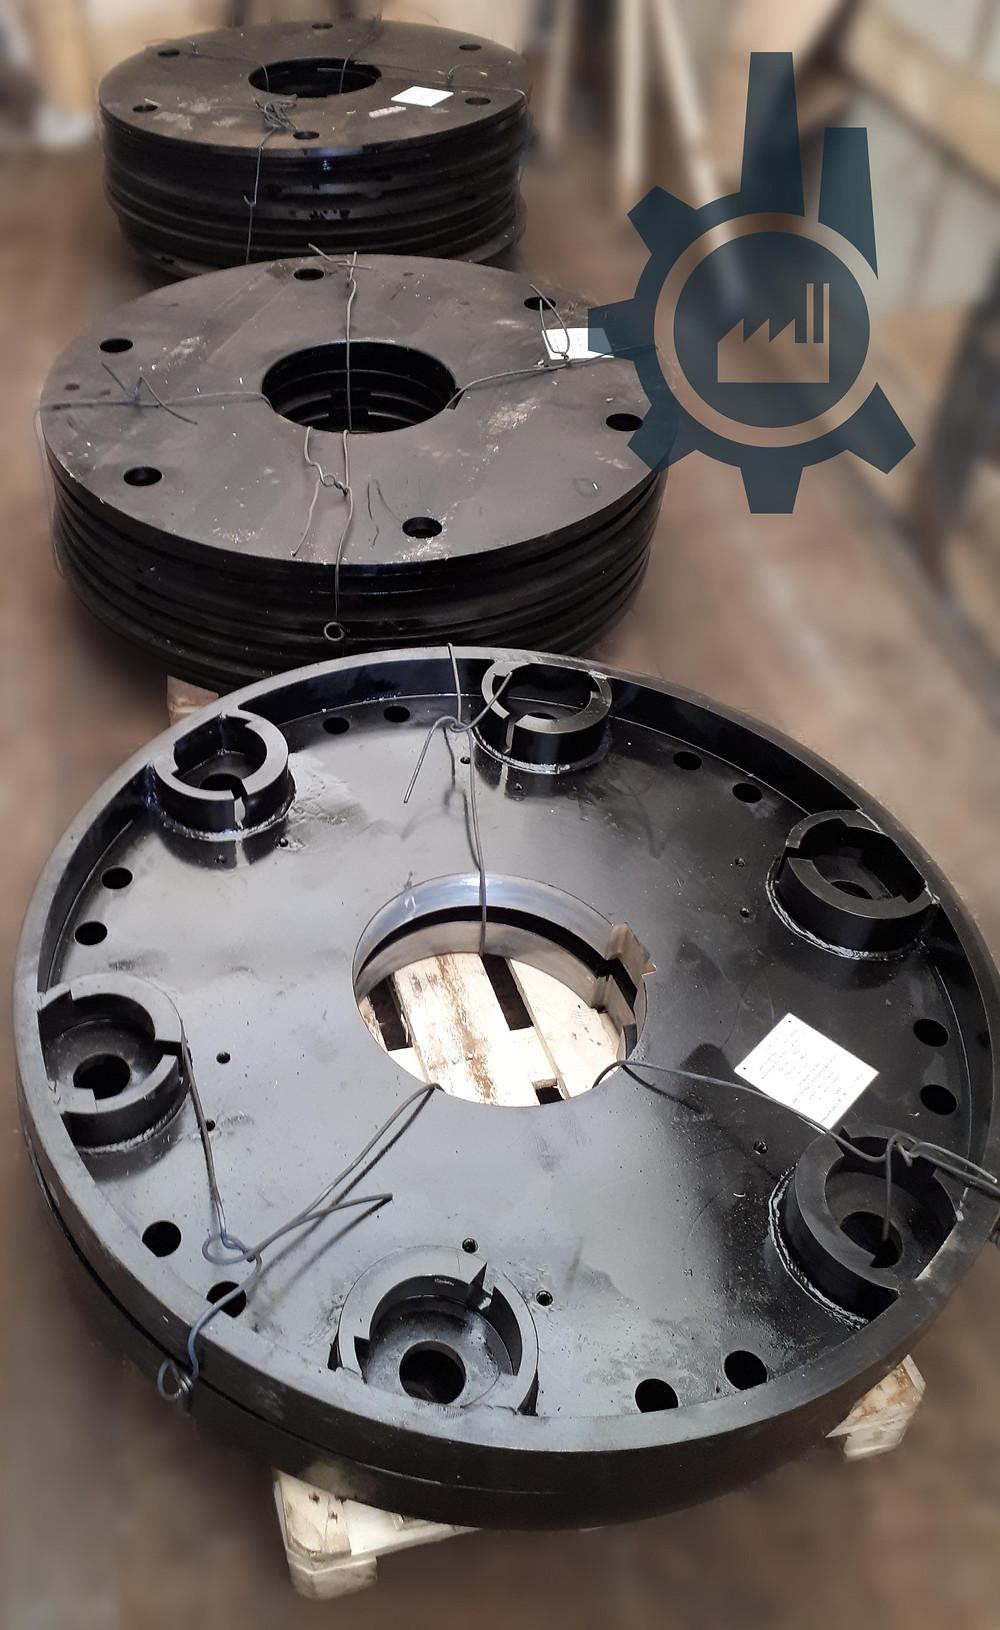 Диски средние и крайний ротора молотковой дробилки